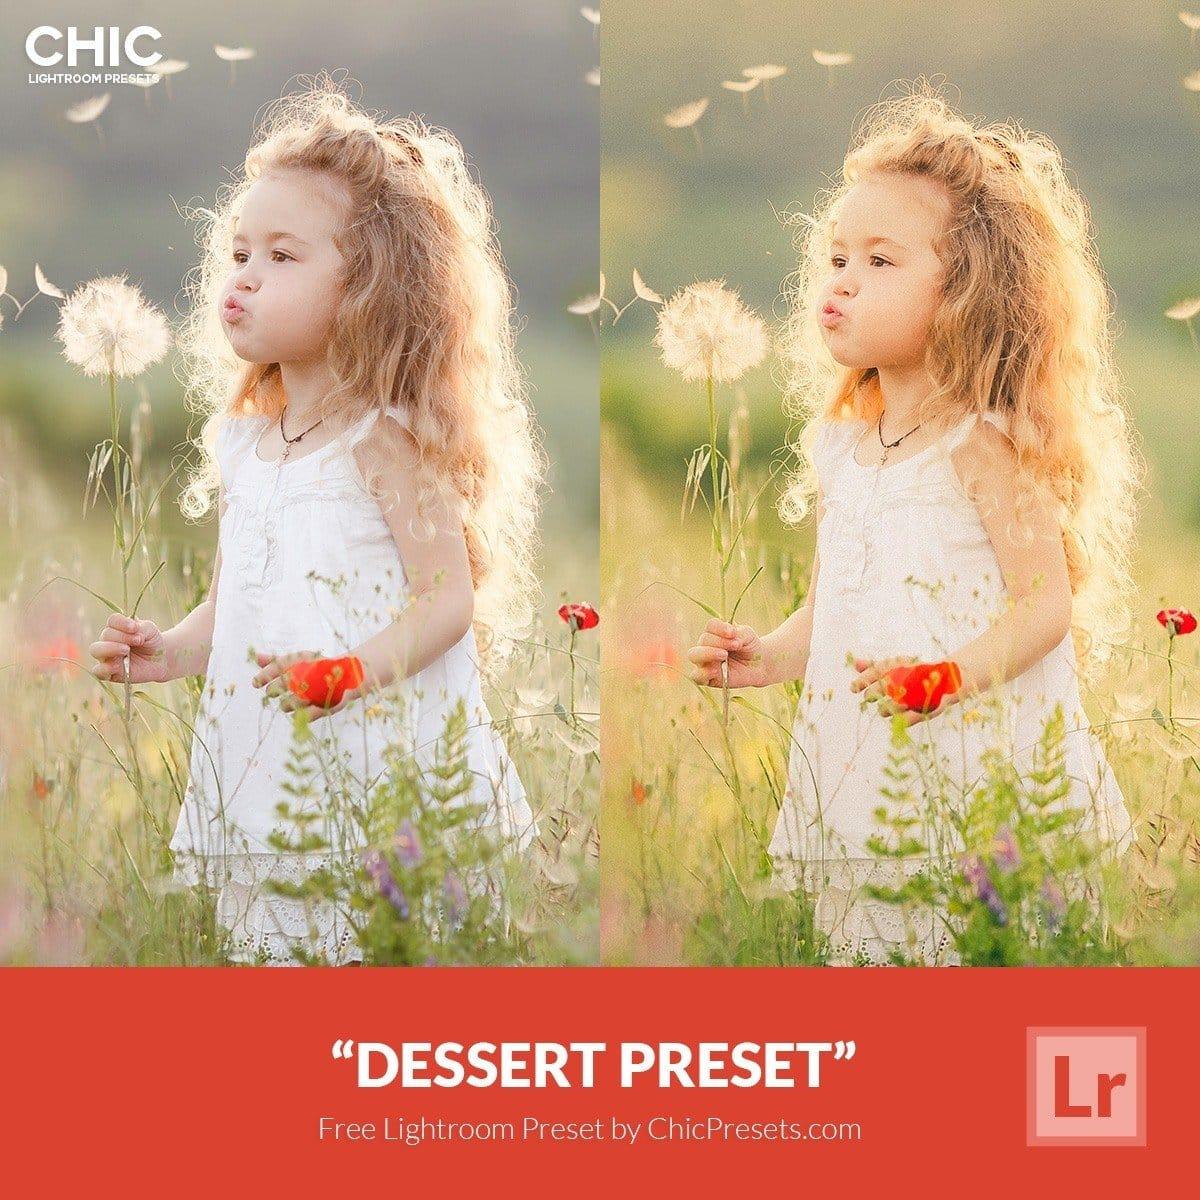 Free-Lightroom-Preset-Dessert-Presetpro.com